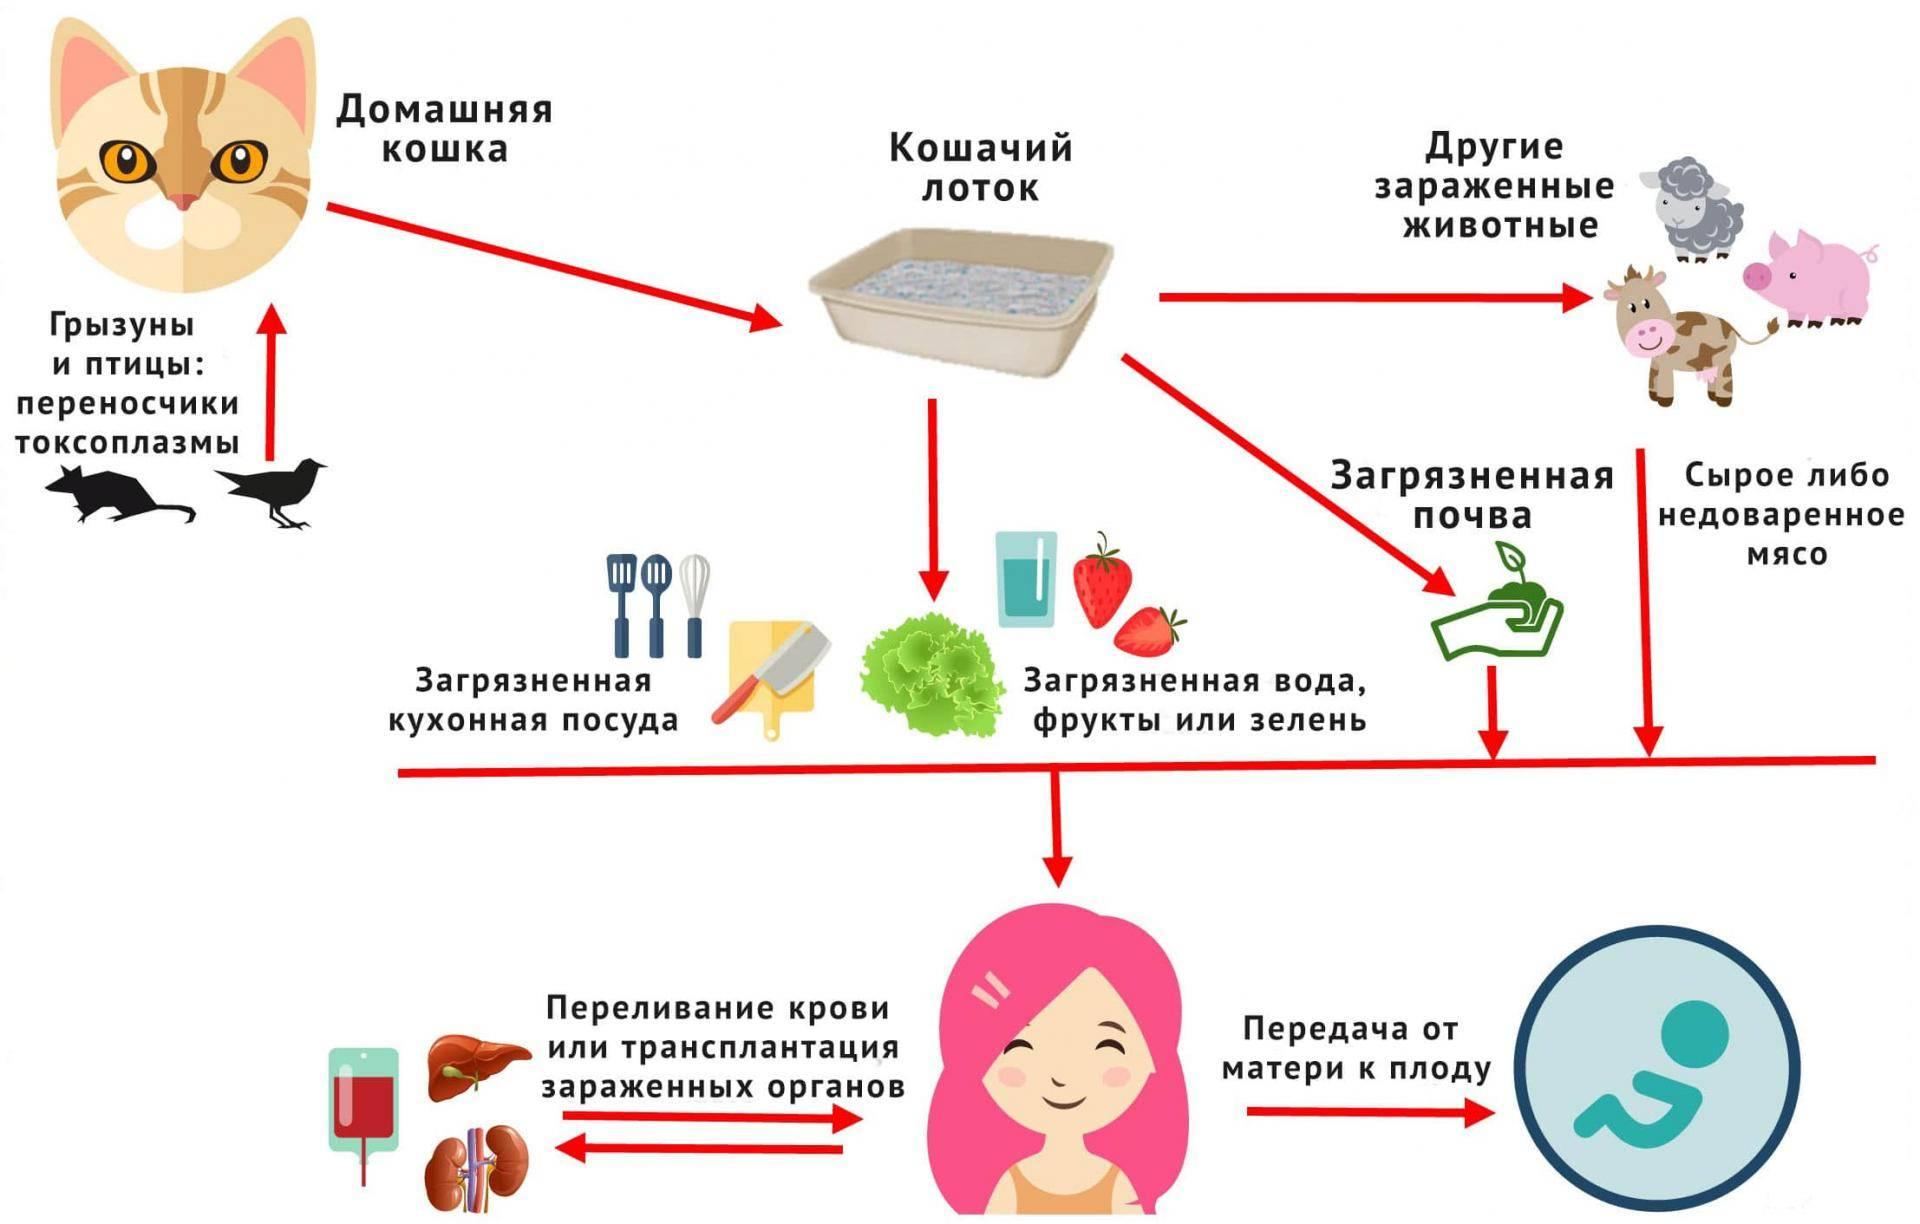 Токсоплазмоз при беременности: токсоплазмоз при беременности